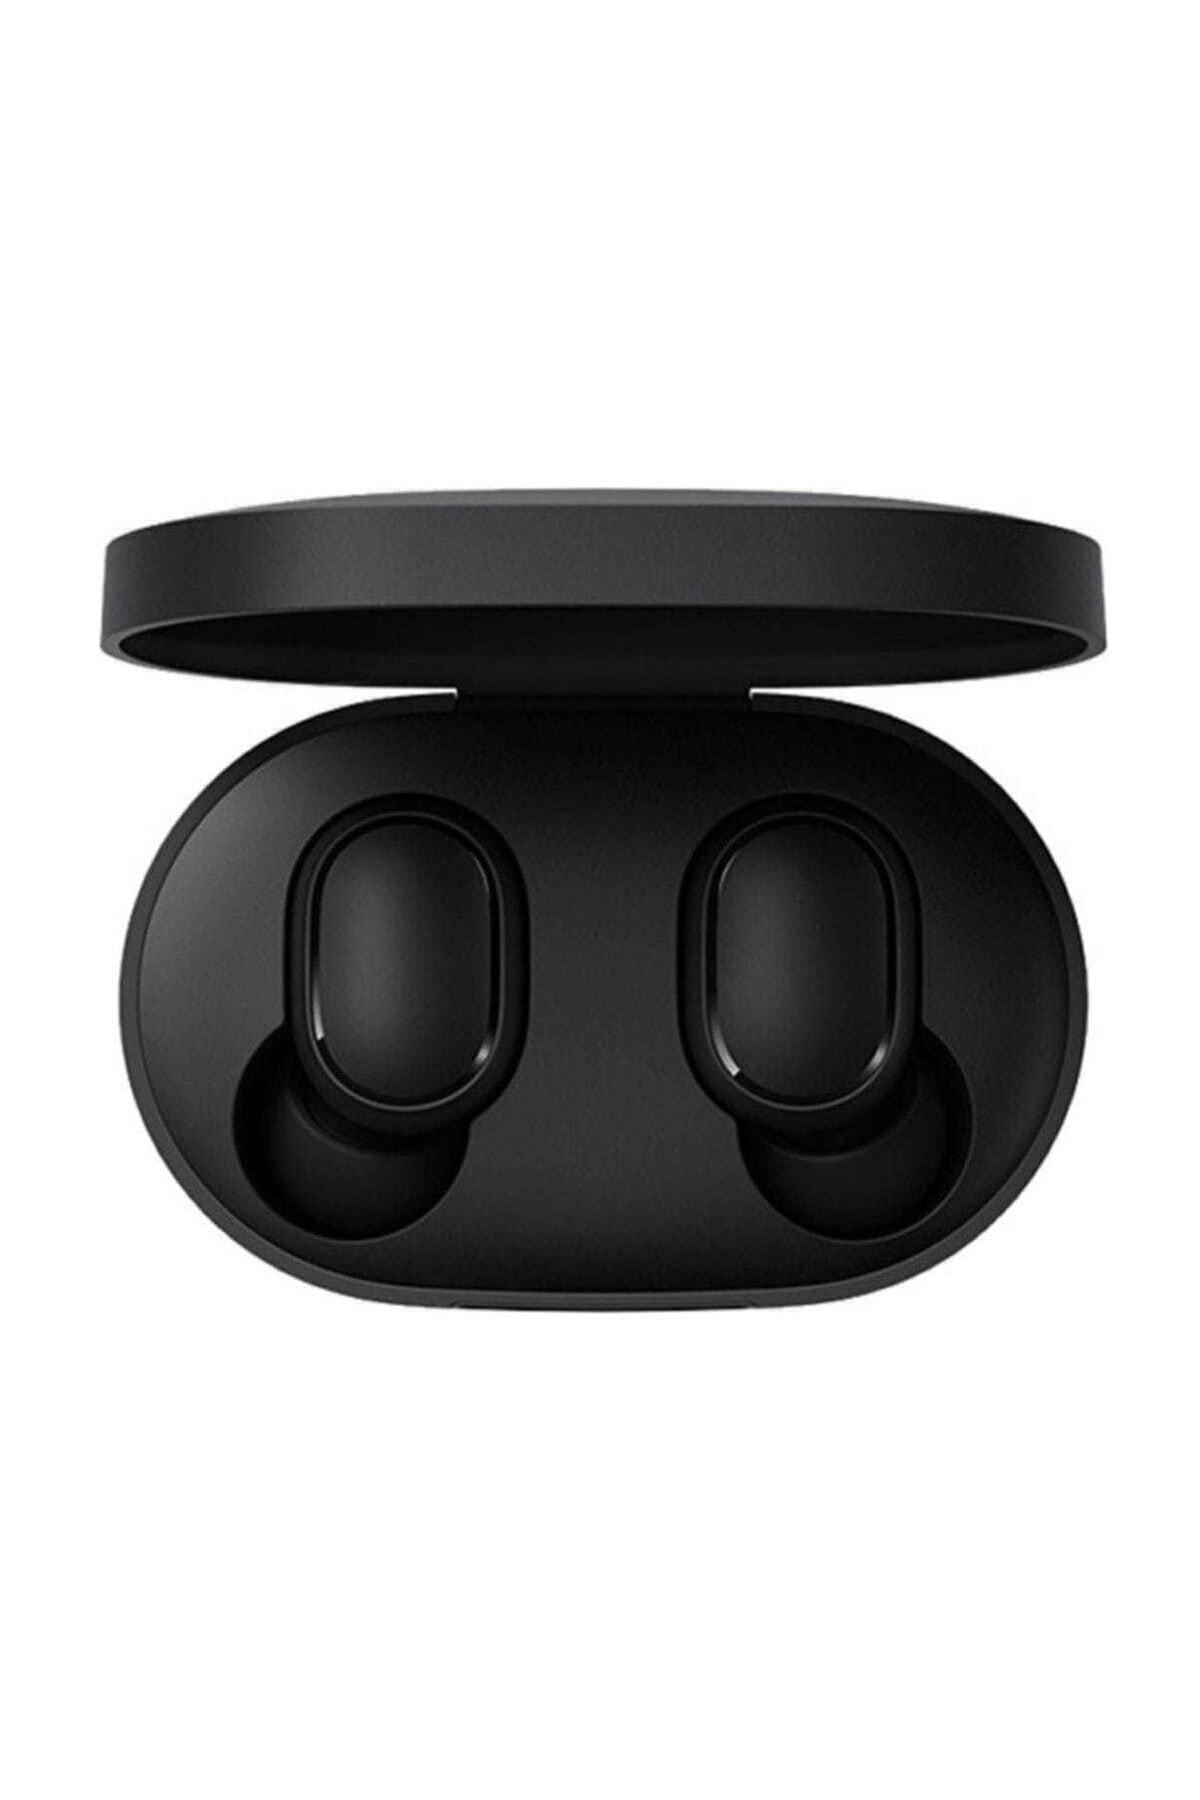 Redmi Airdots Tws Bluetooth Basic 5.0 Kulaklık